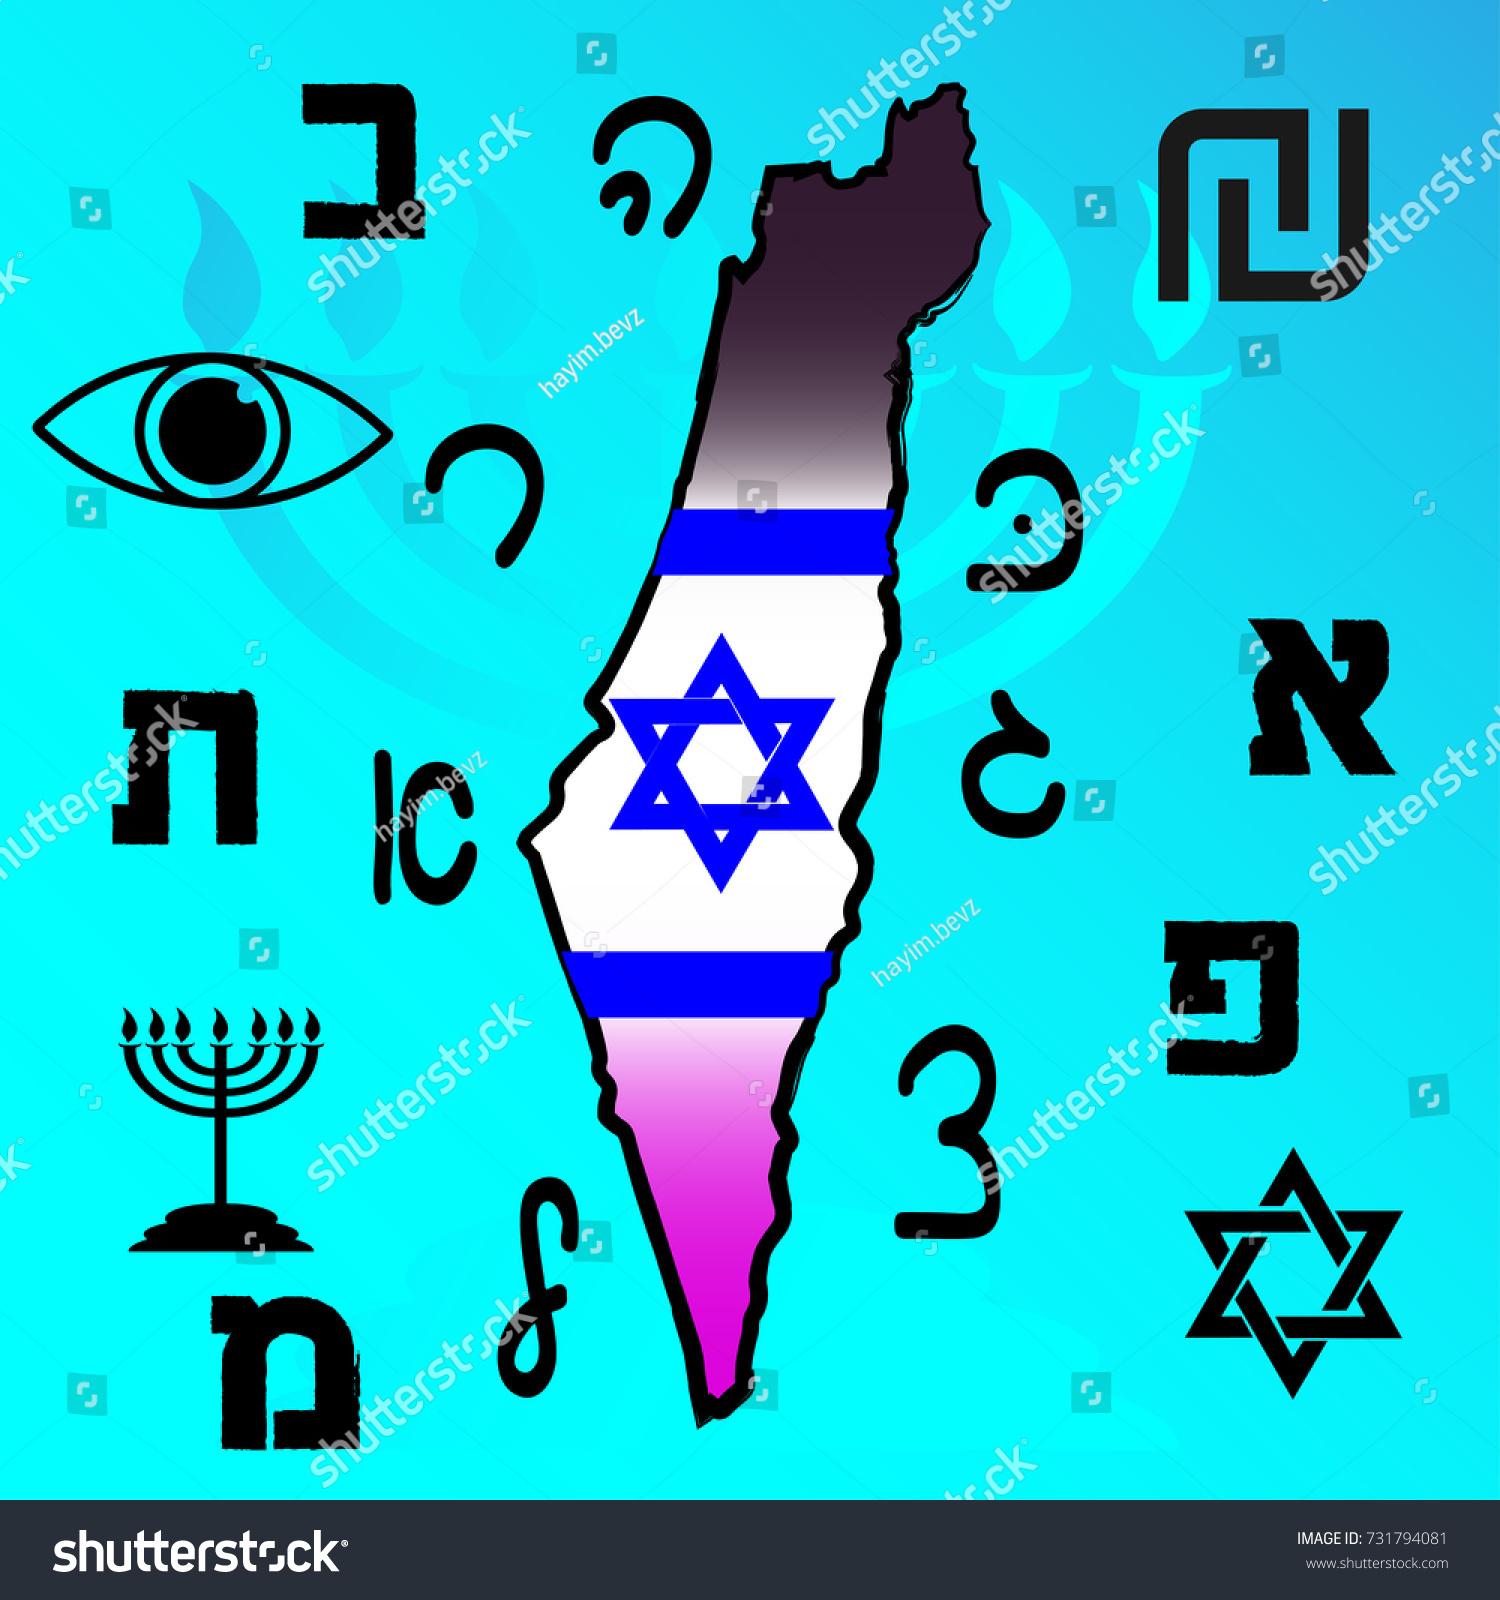 Jewish symbol of life image collections symbol and sign ideas map israel symbols jewish culture life stock vector 731794081 map of israel with symbols of jewish biocorpaavc